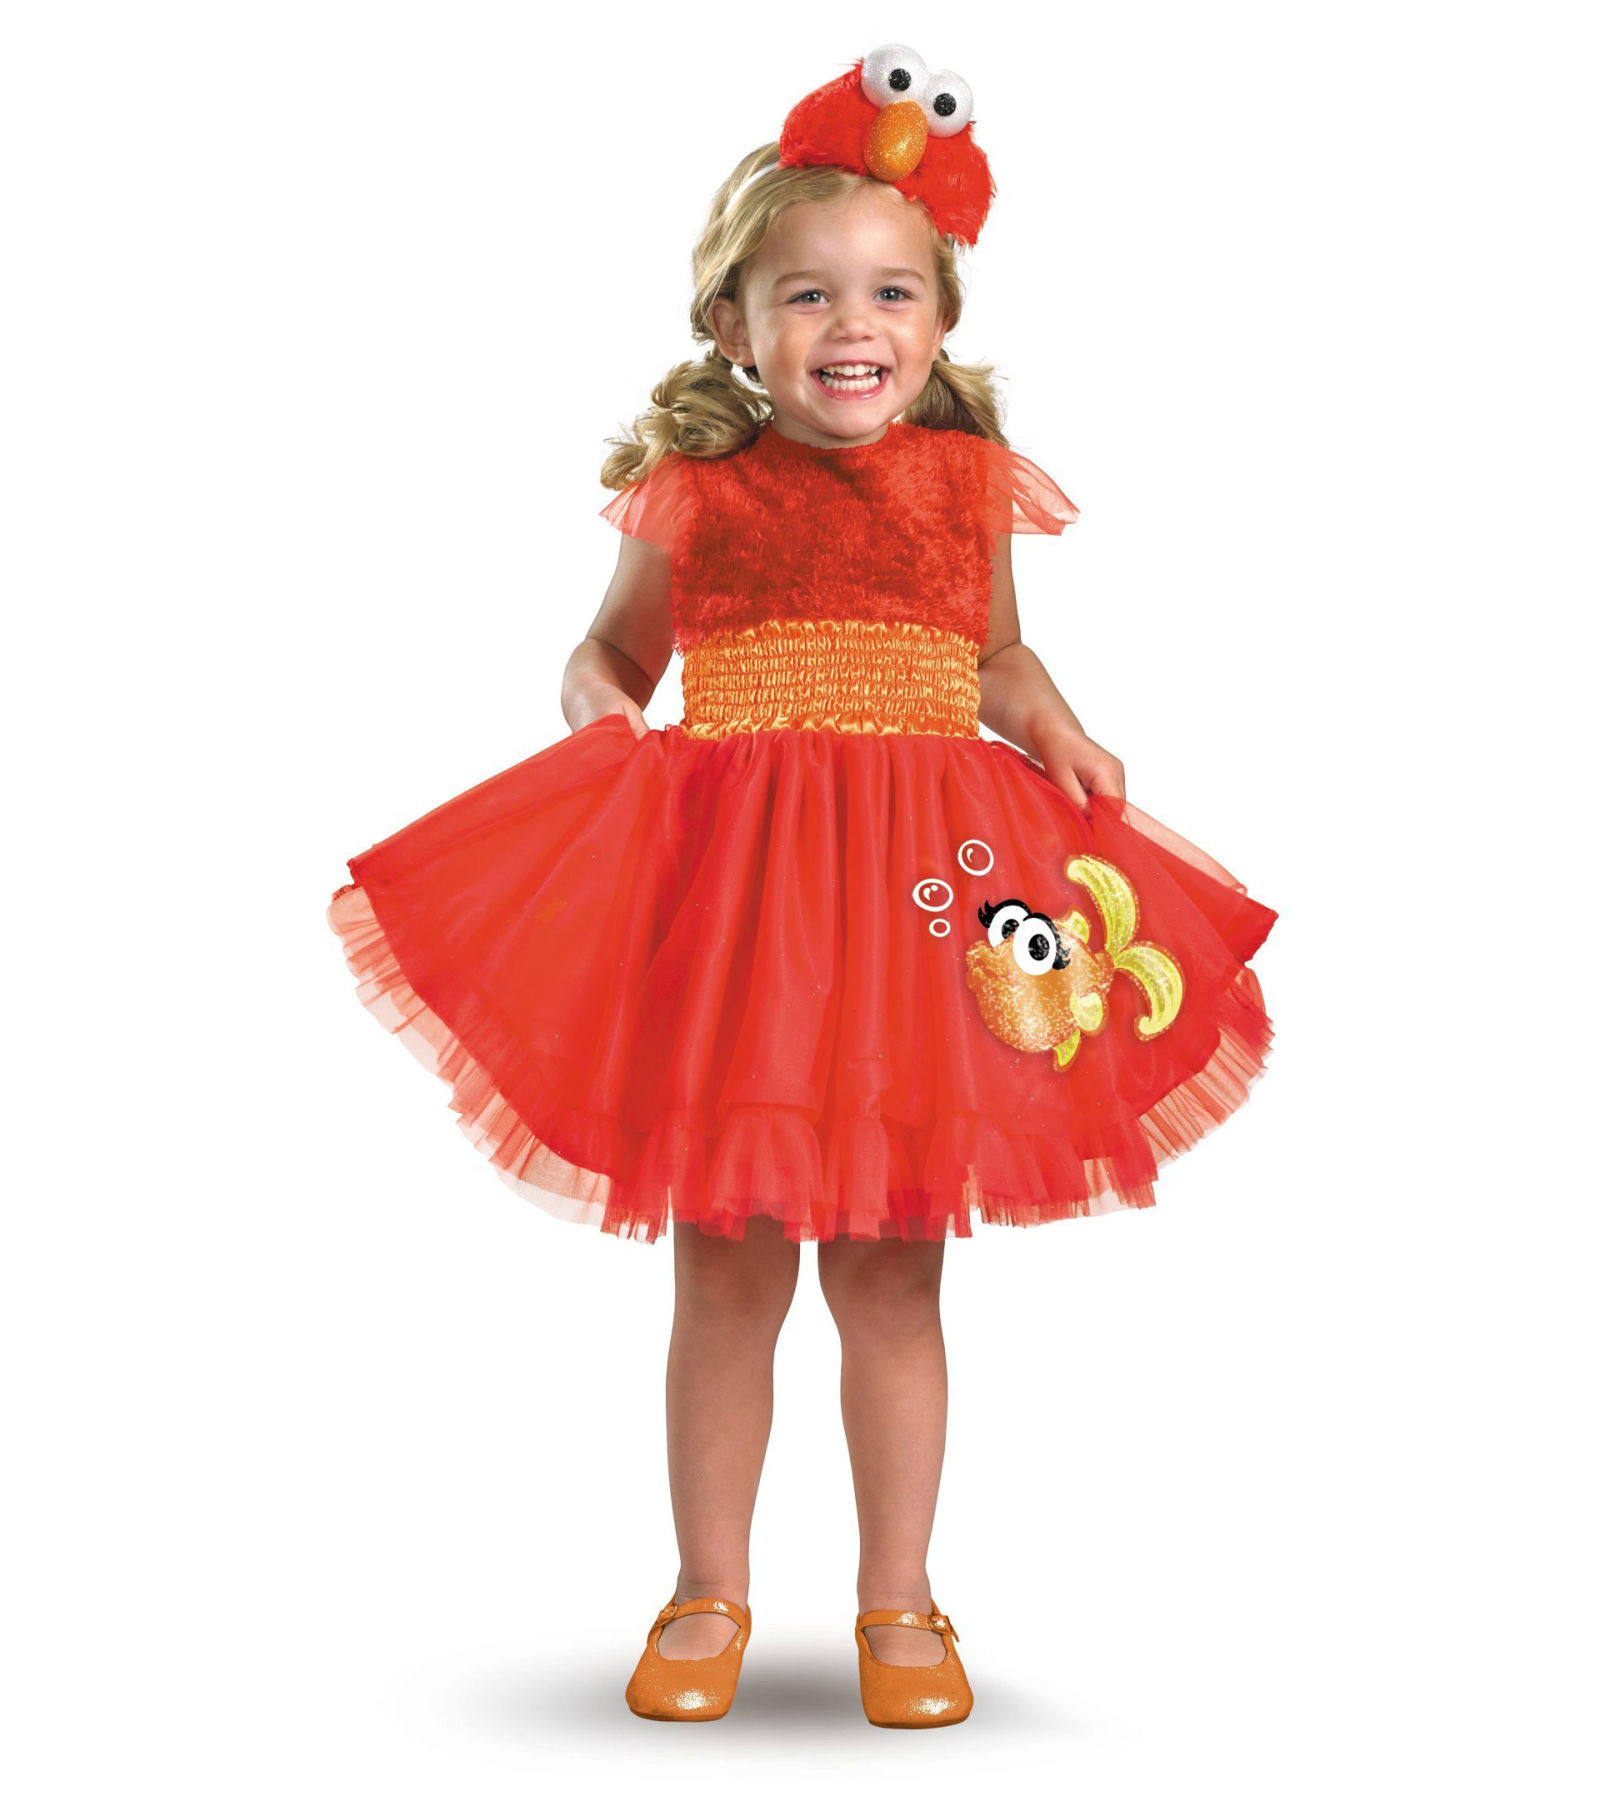 Cute halloween costumes for kids cute childrens for Halloween costume ideas for kids girls